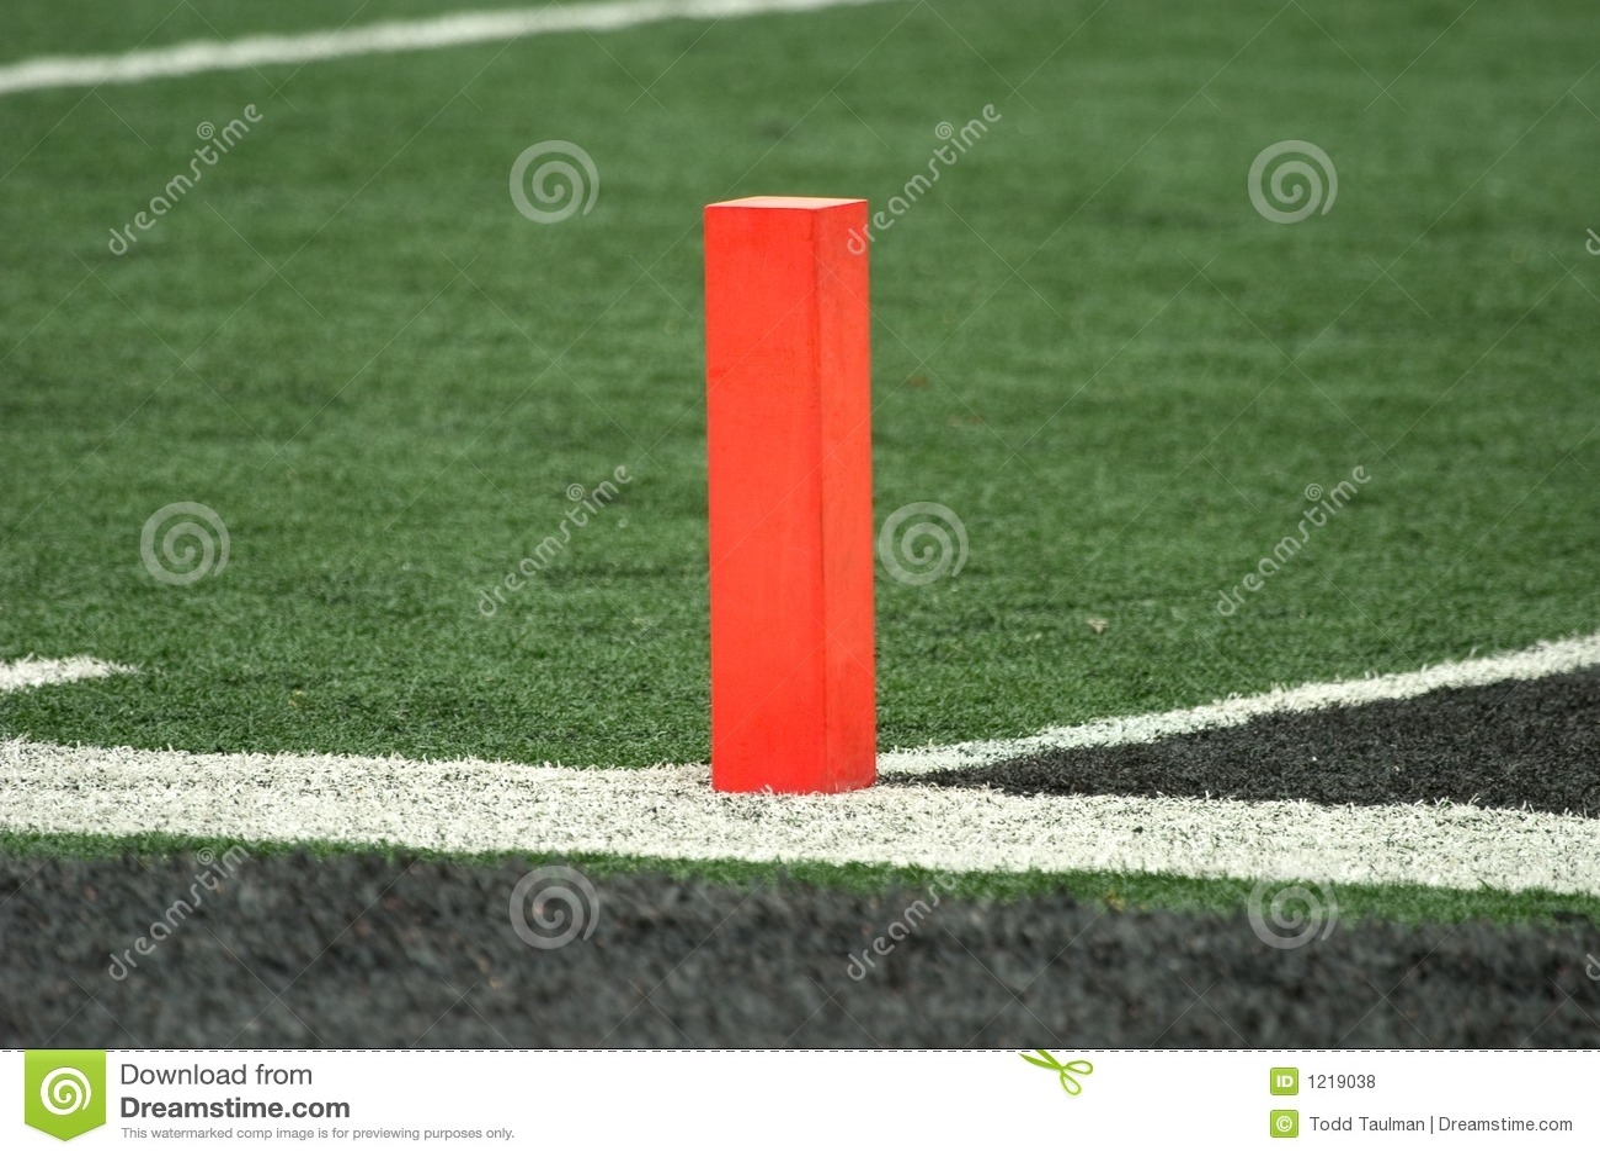 Football Goal Line Pylon Royalty Free Stock Photos Image